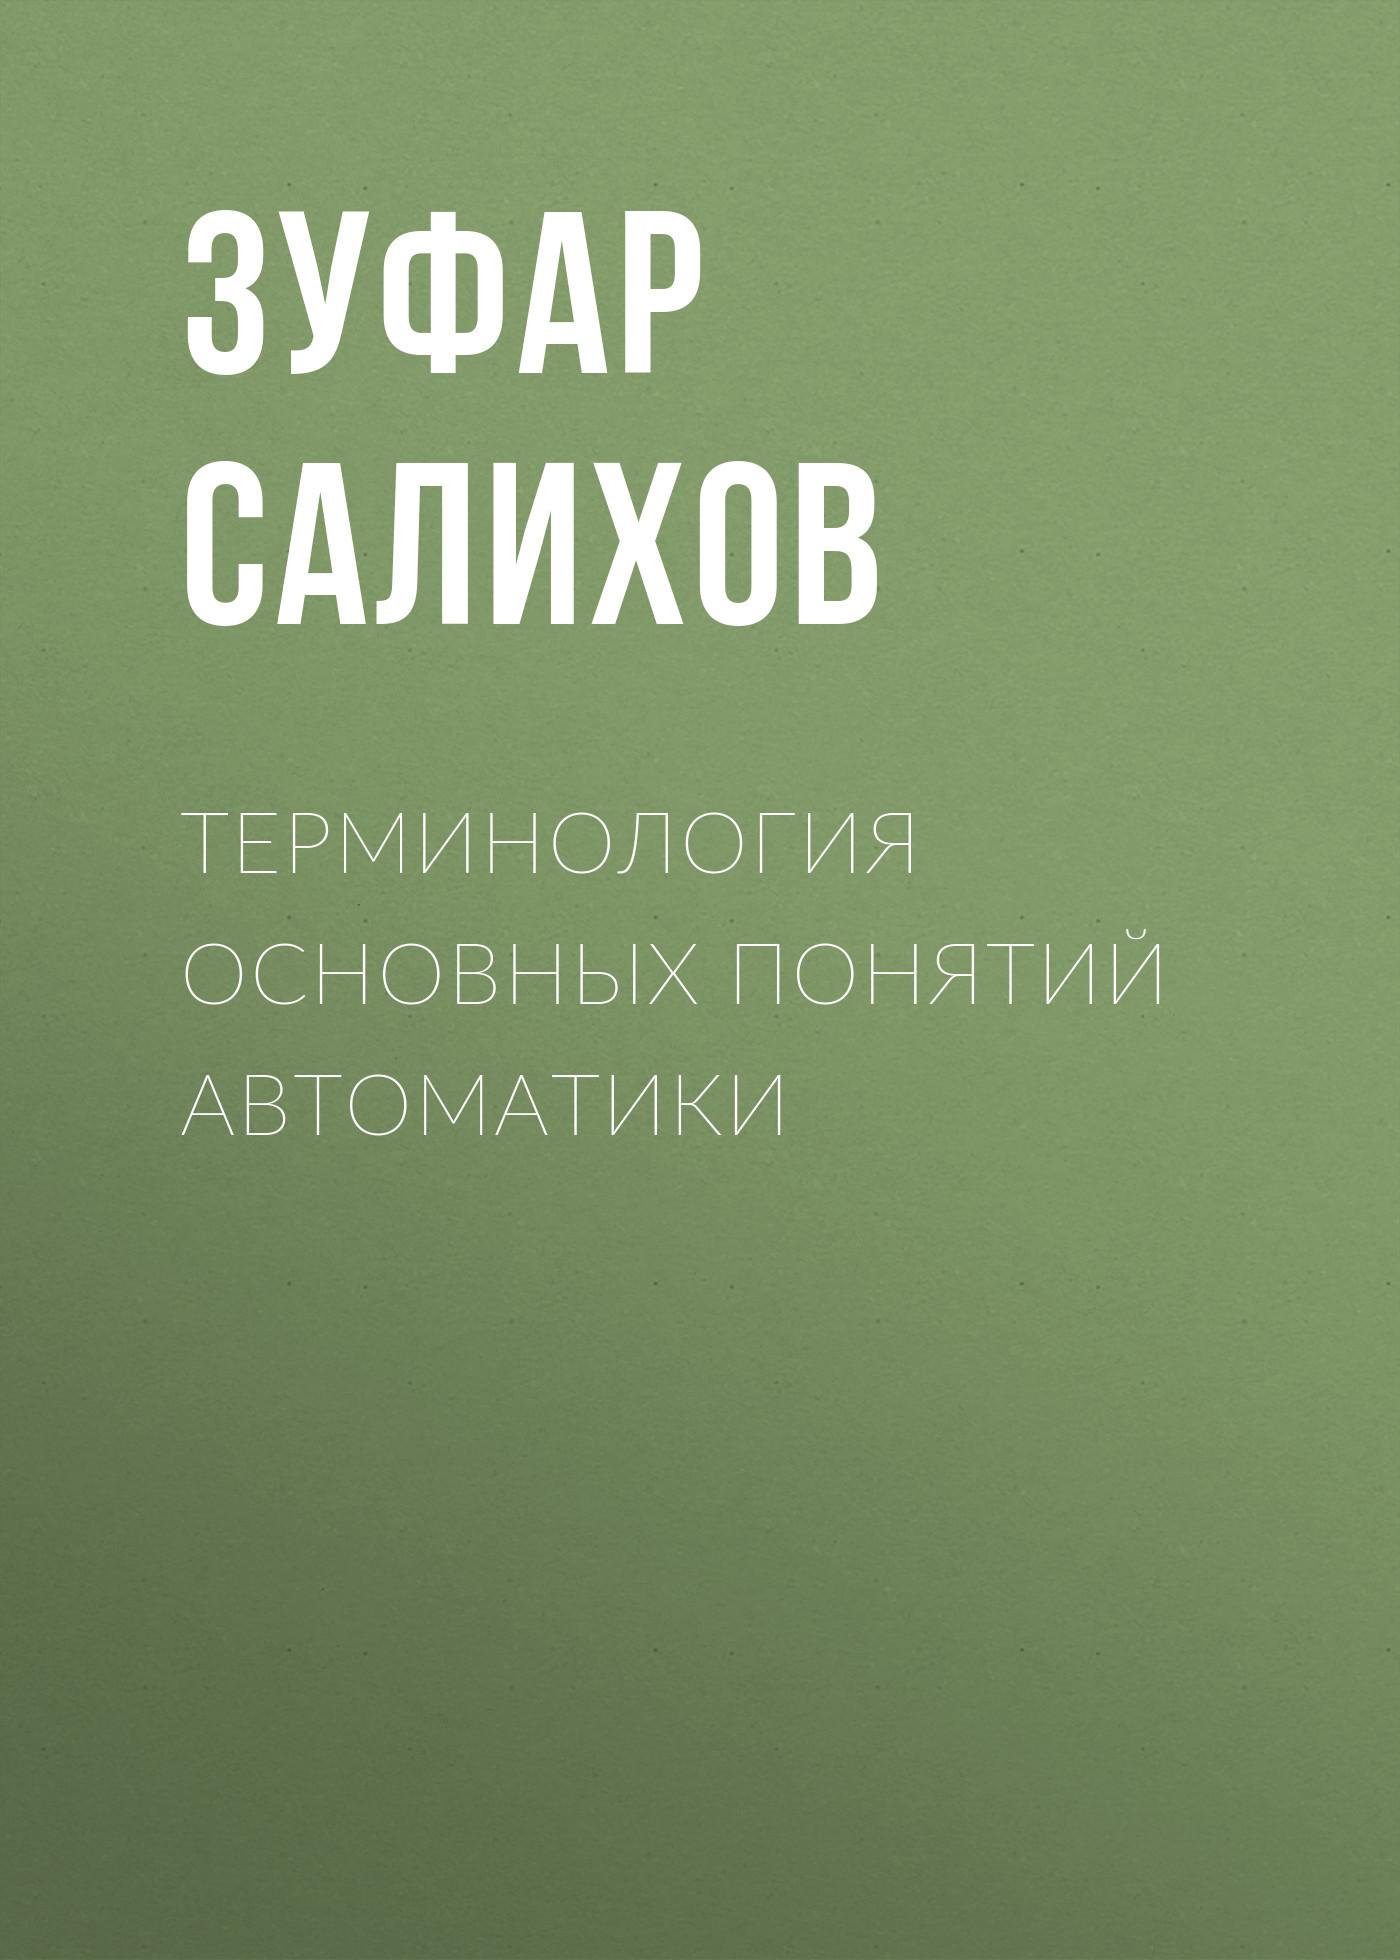 Зуфар Салихов. Терминология основных понятий автоматики